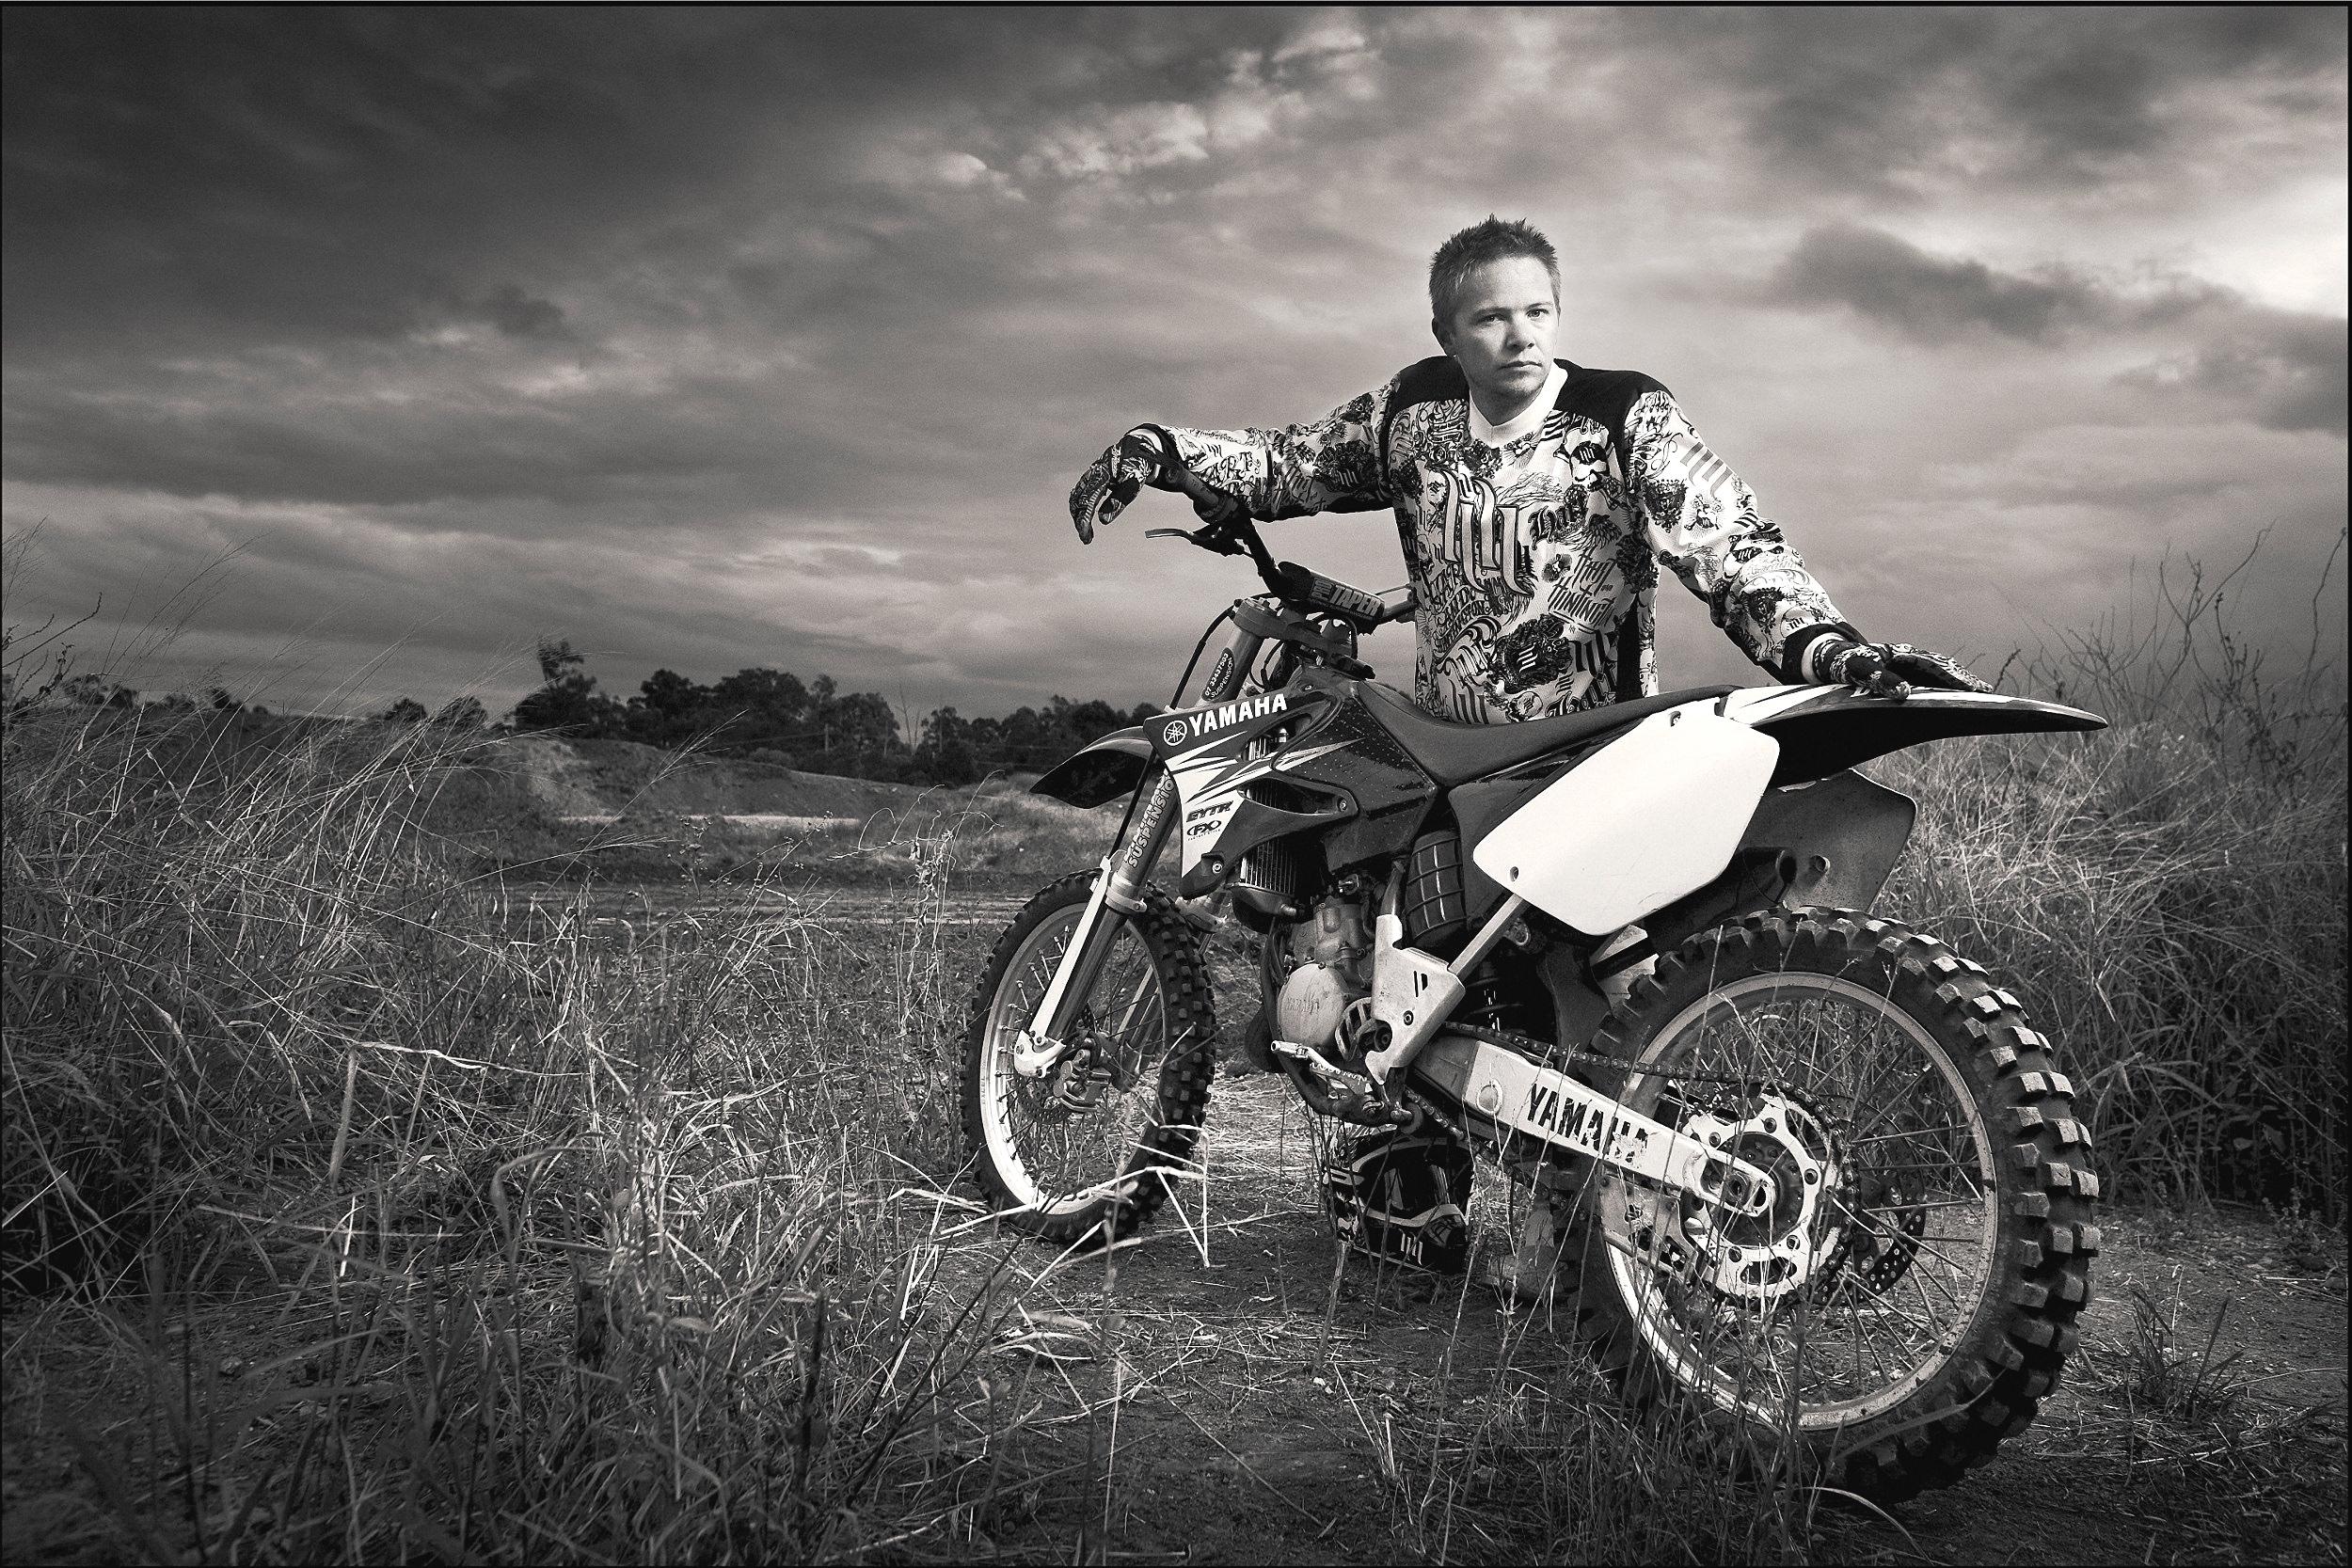 Tutorials-moto-cross-bike-flash-ambien-light-mix.jpg